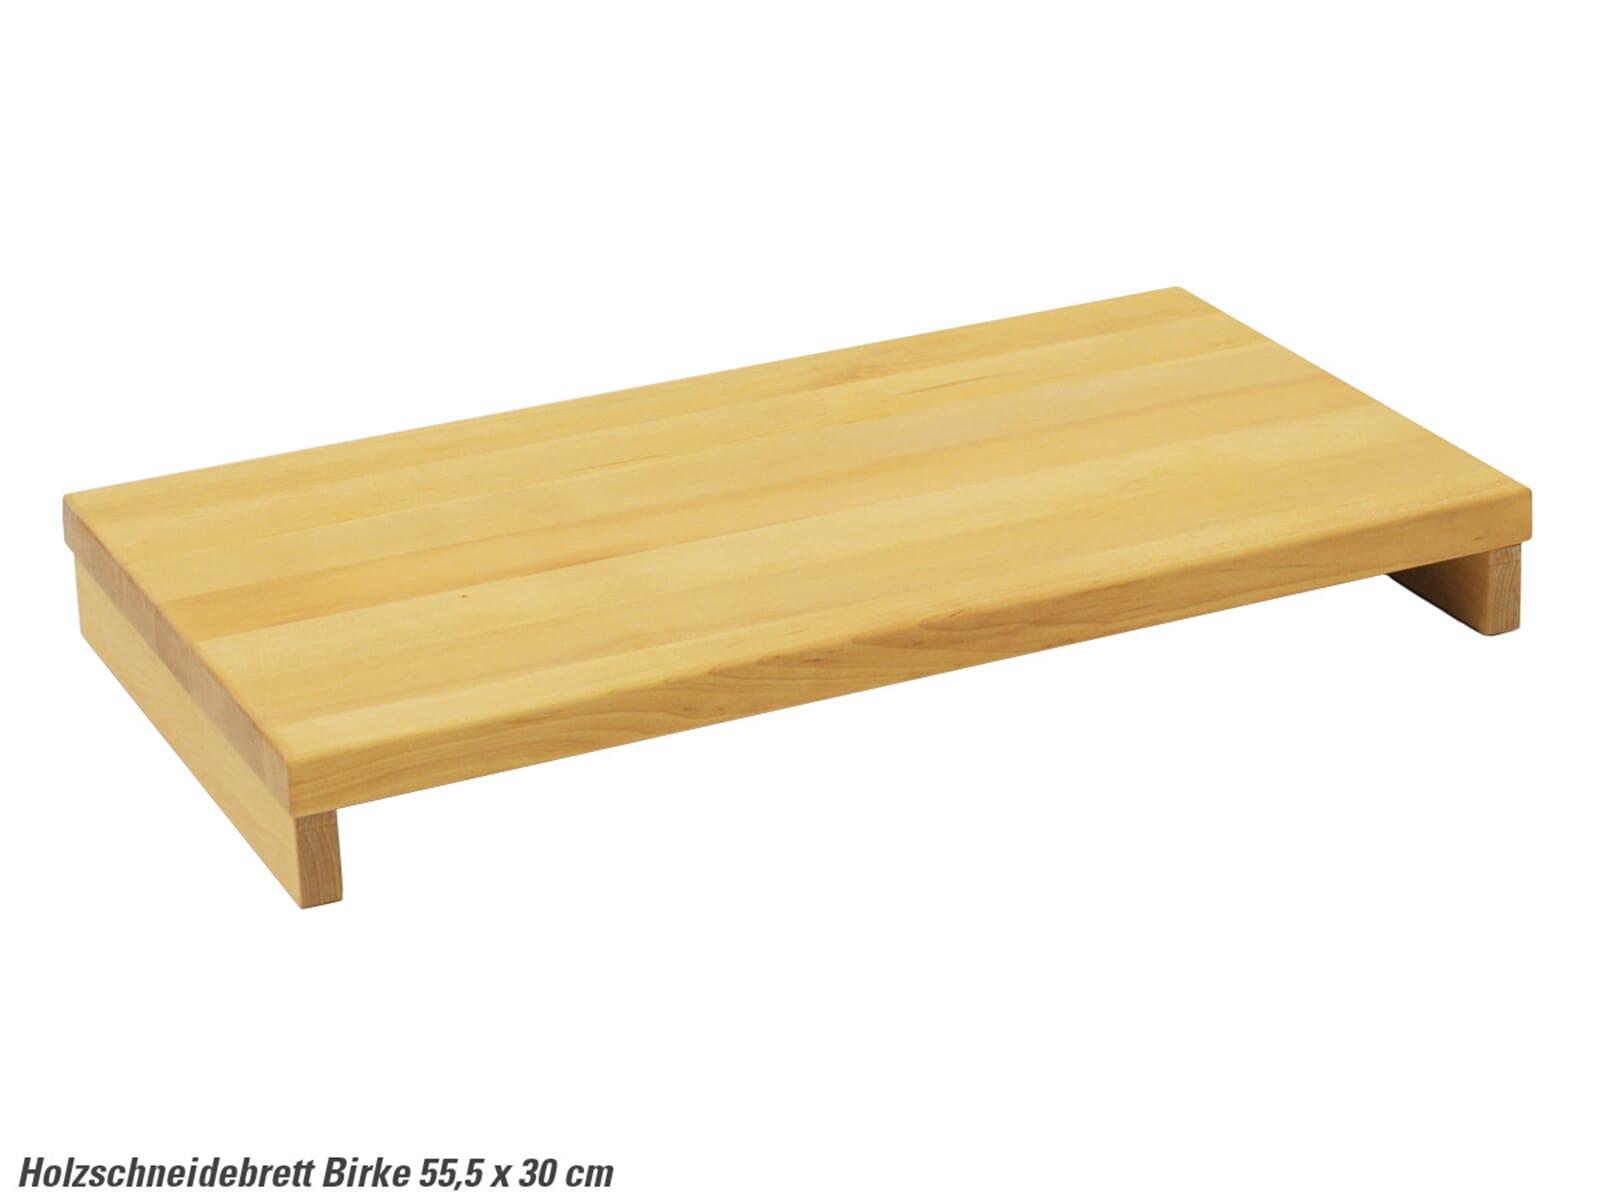 br ckenschneidebrett aus birke f r 51 cm sp lentiefe. Black Bedroom Furniture Sets. Home Design Ideas